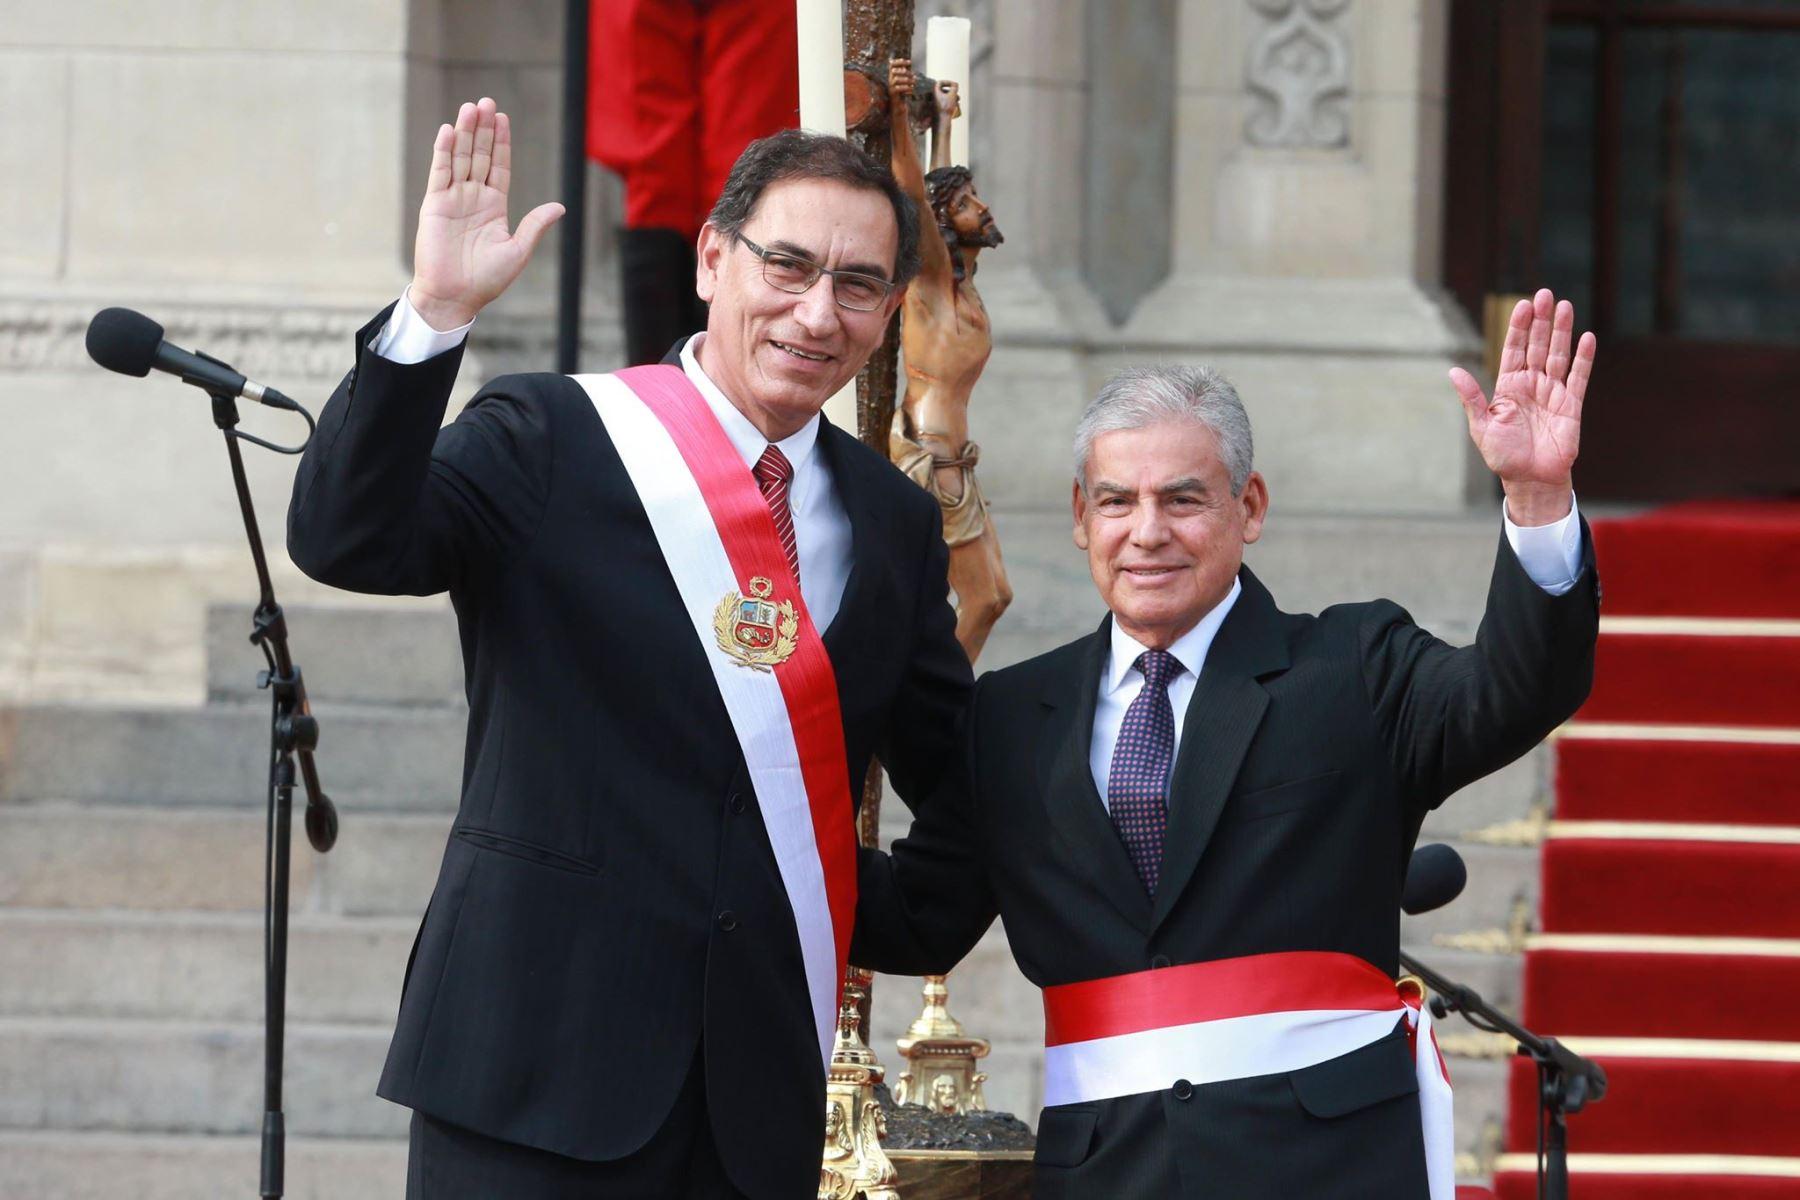 Presidente Vizcarra toma juramento a nuevo Gabinete encabezado por César Villanueva. Foto: ANDINA/ Vidal Tarqui